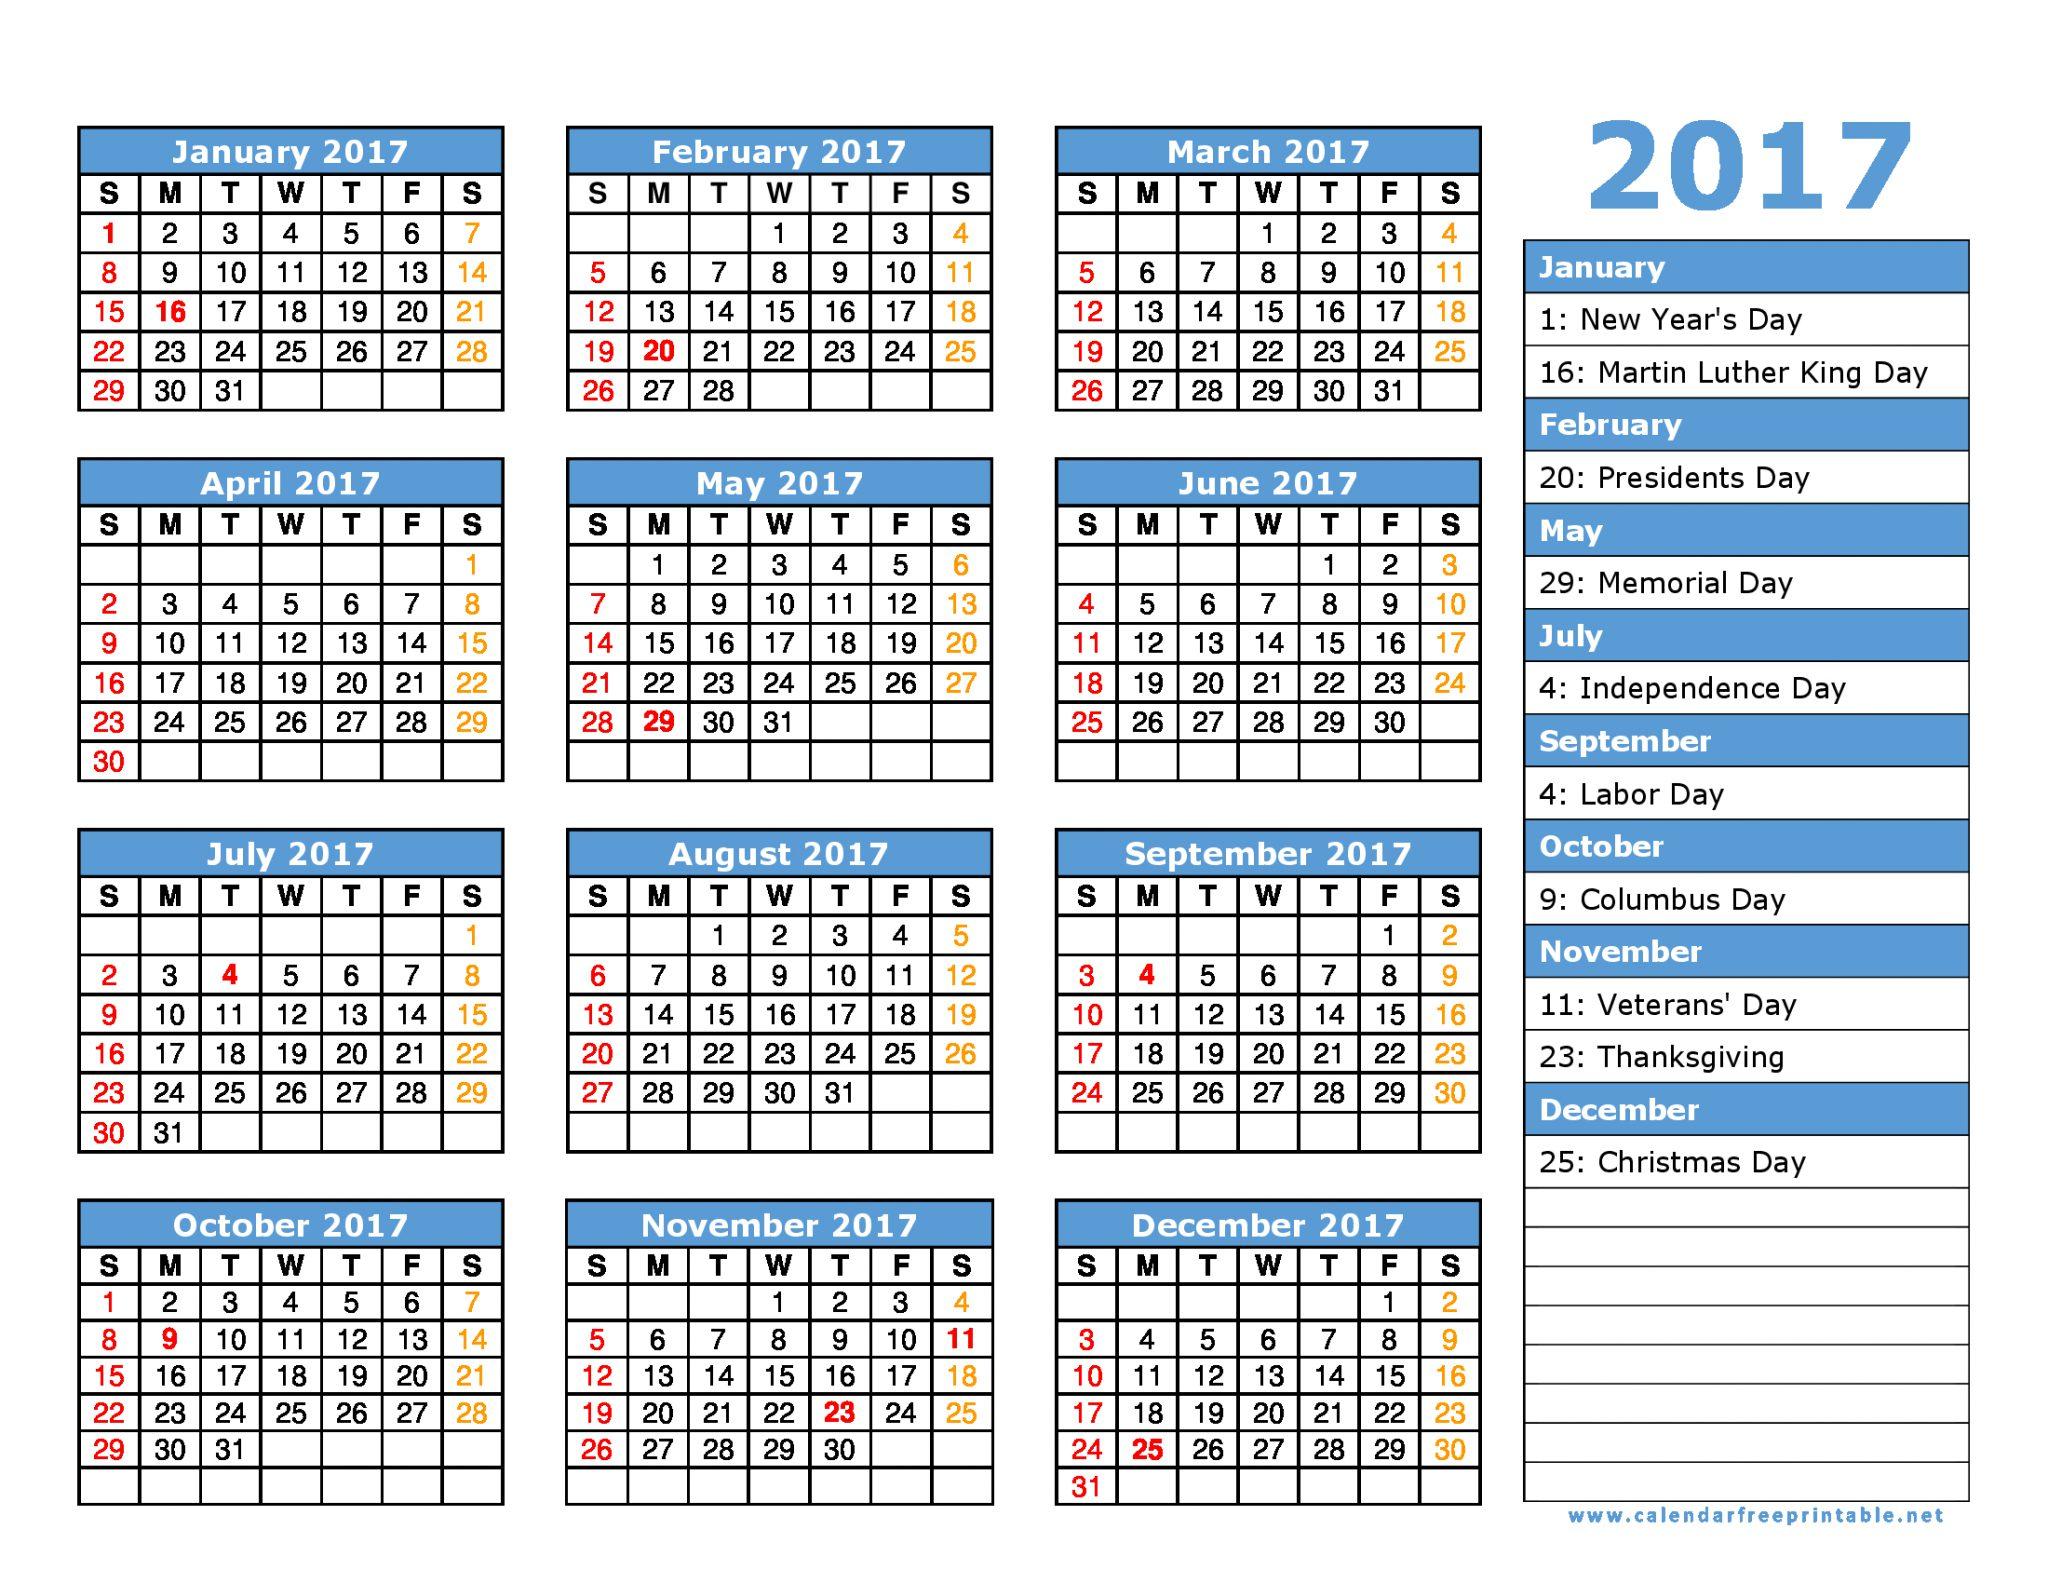 2017 Calendar Holidays Printable